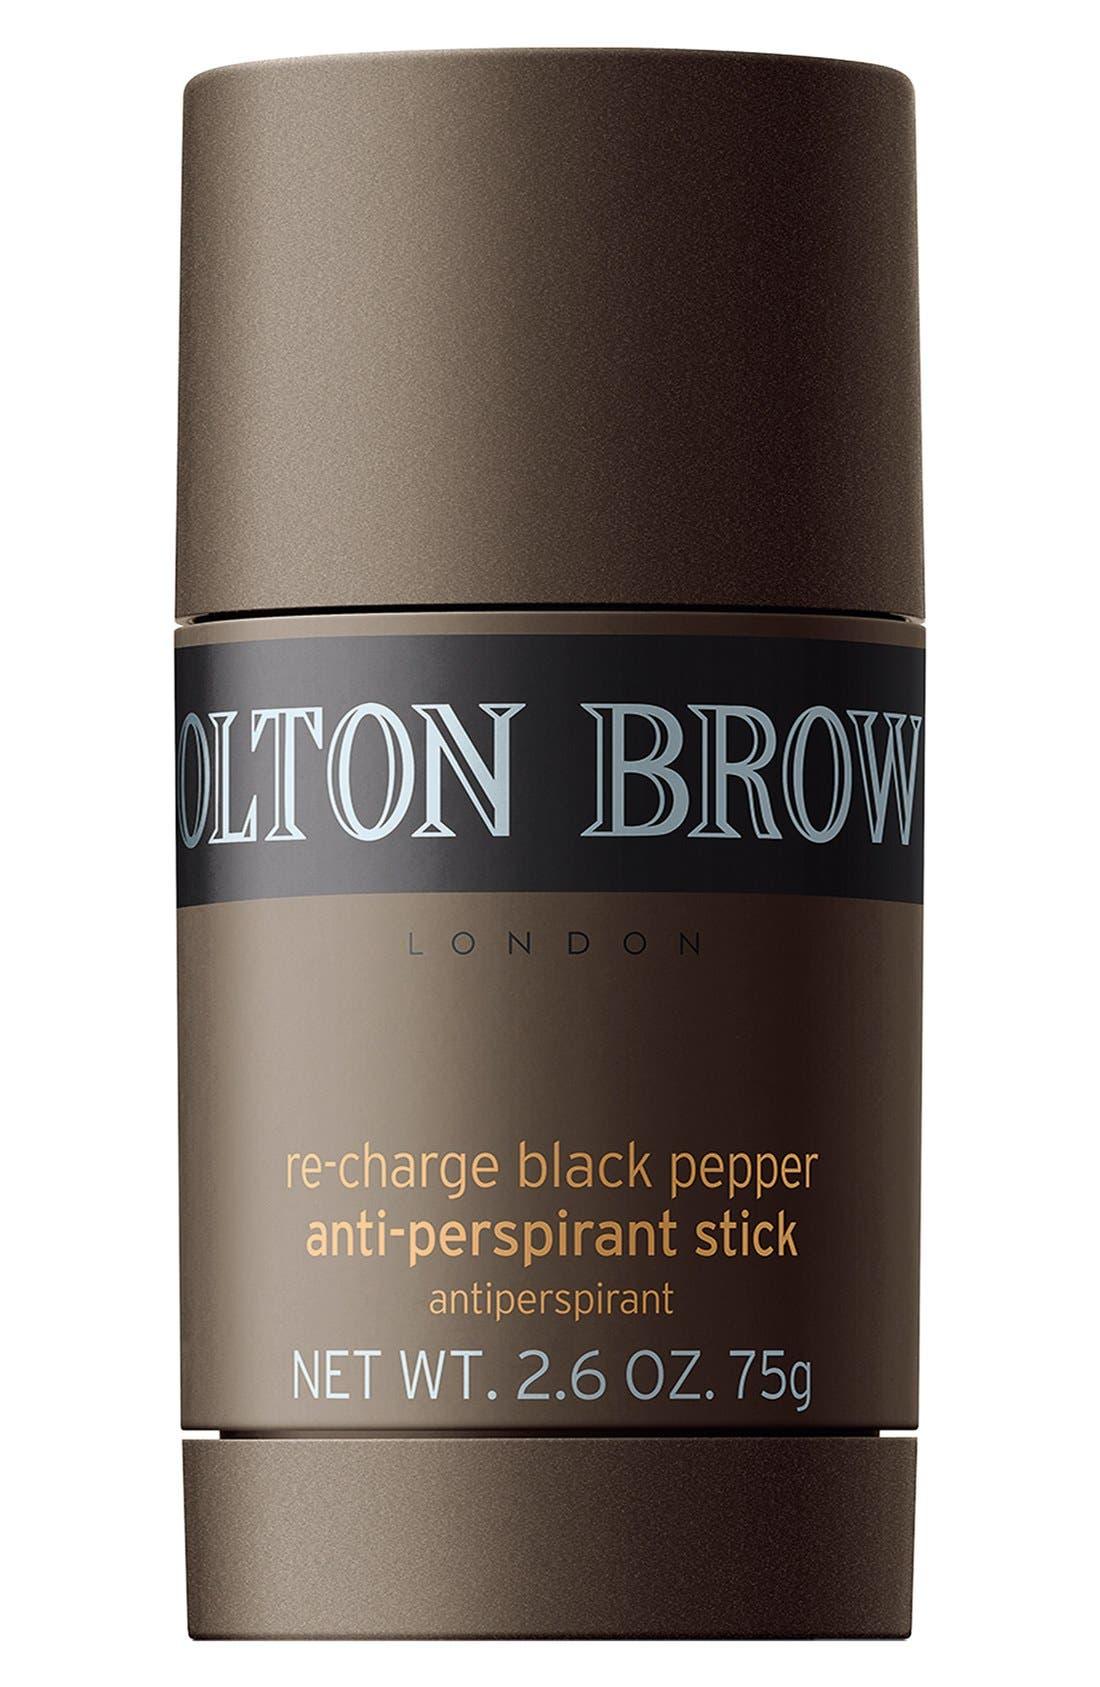 MOLTON BROWN London 'Re-Charge Black Pepper' Anti-Perspirant Stick